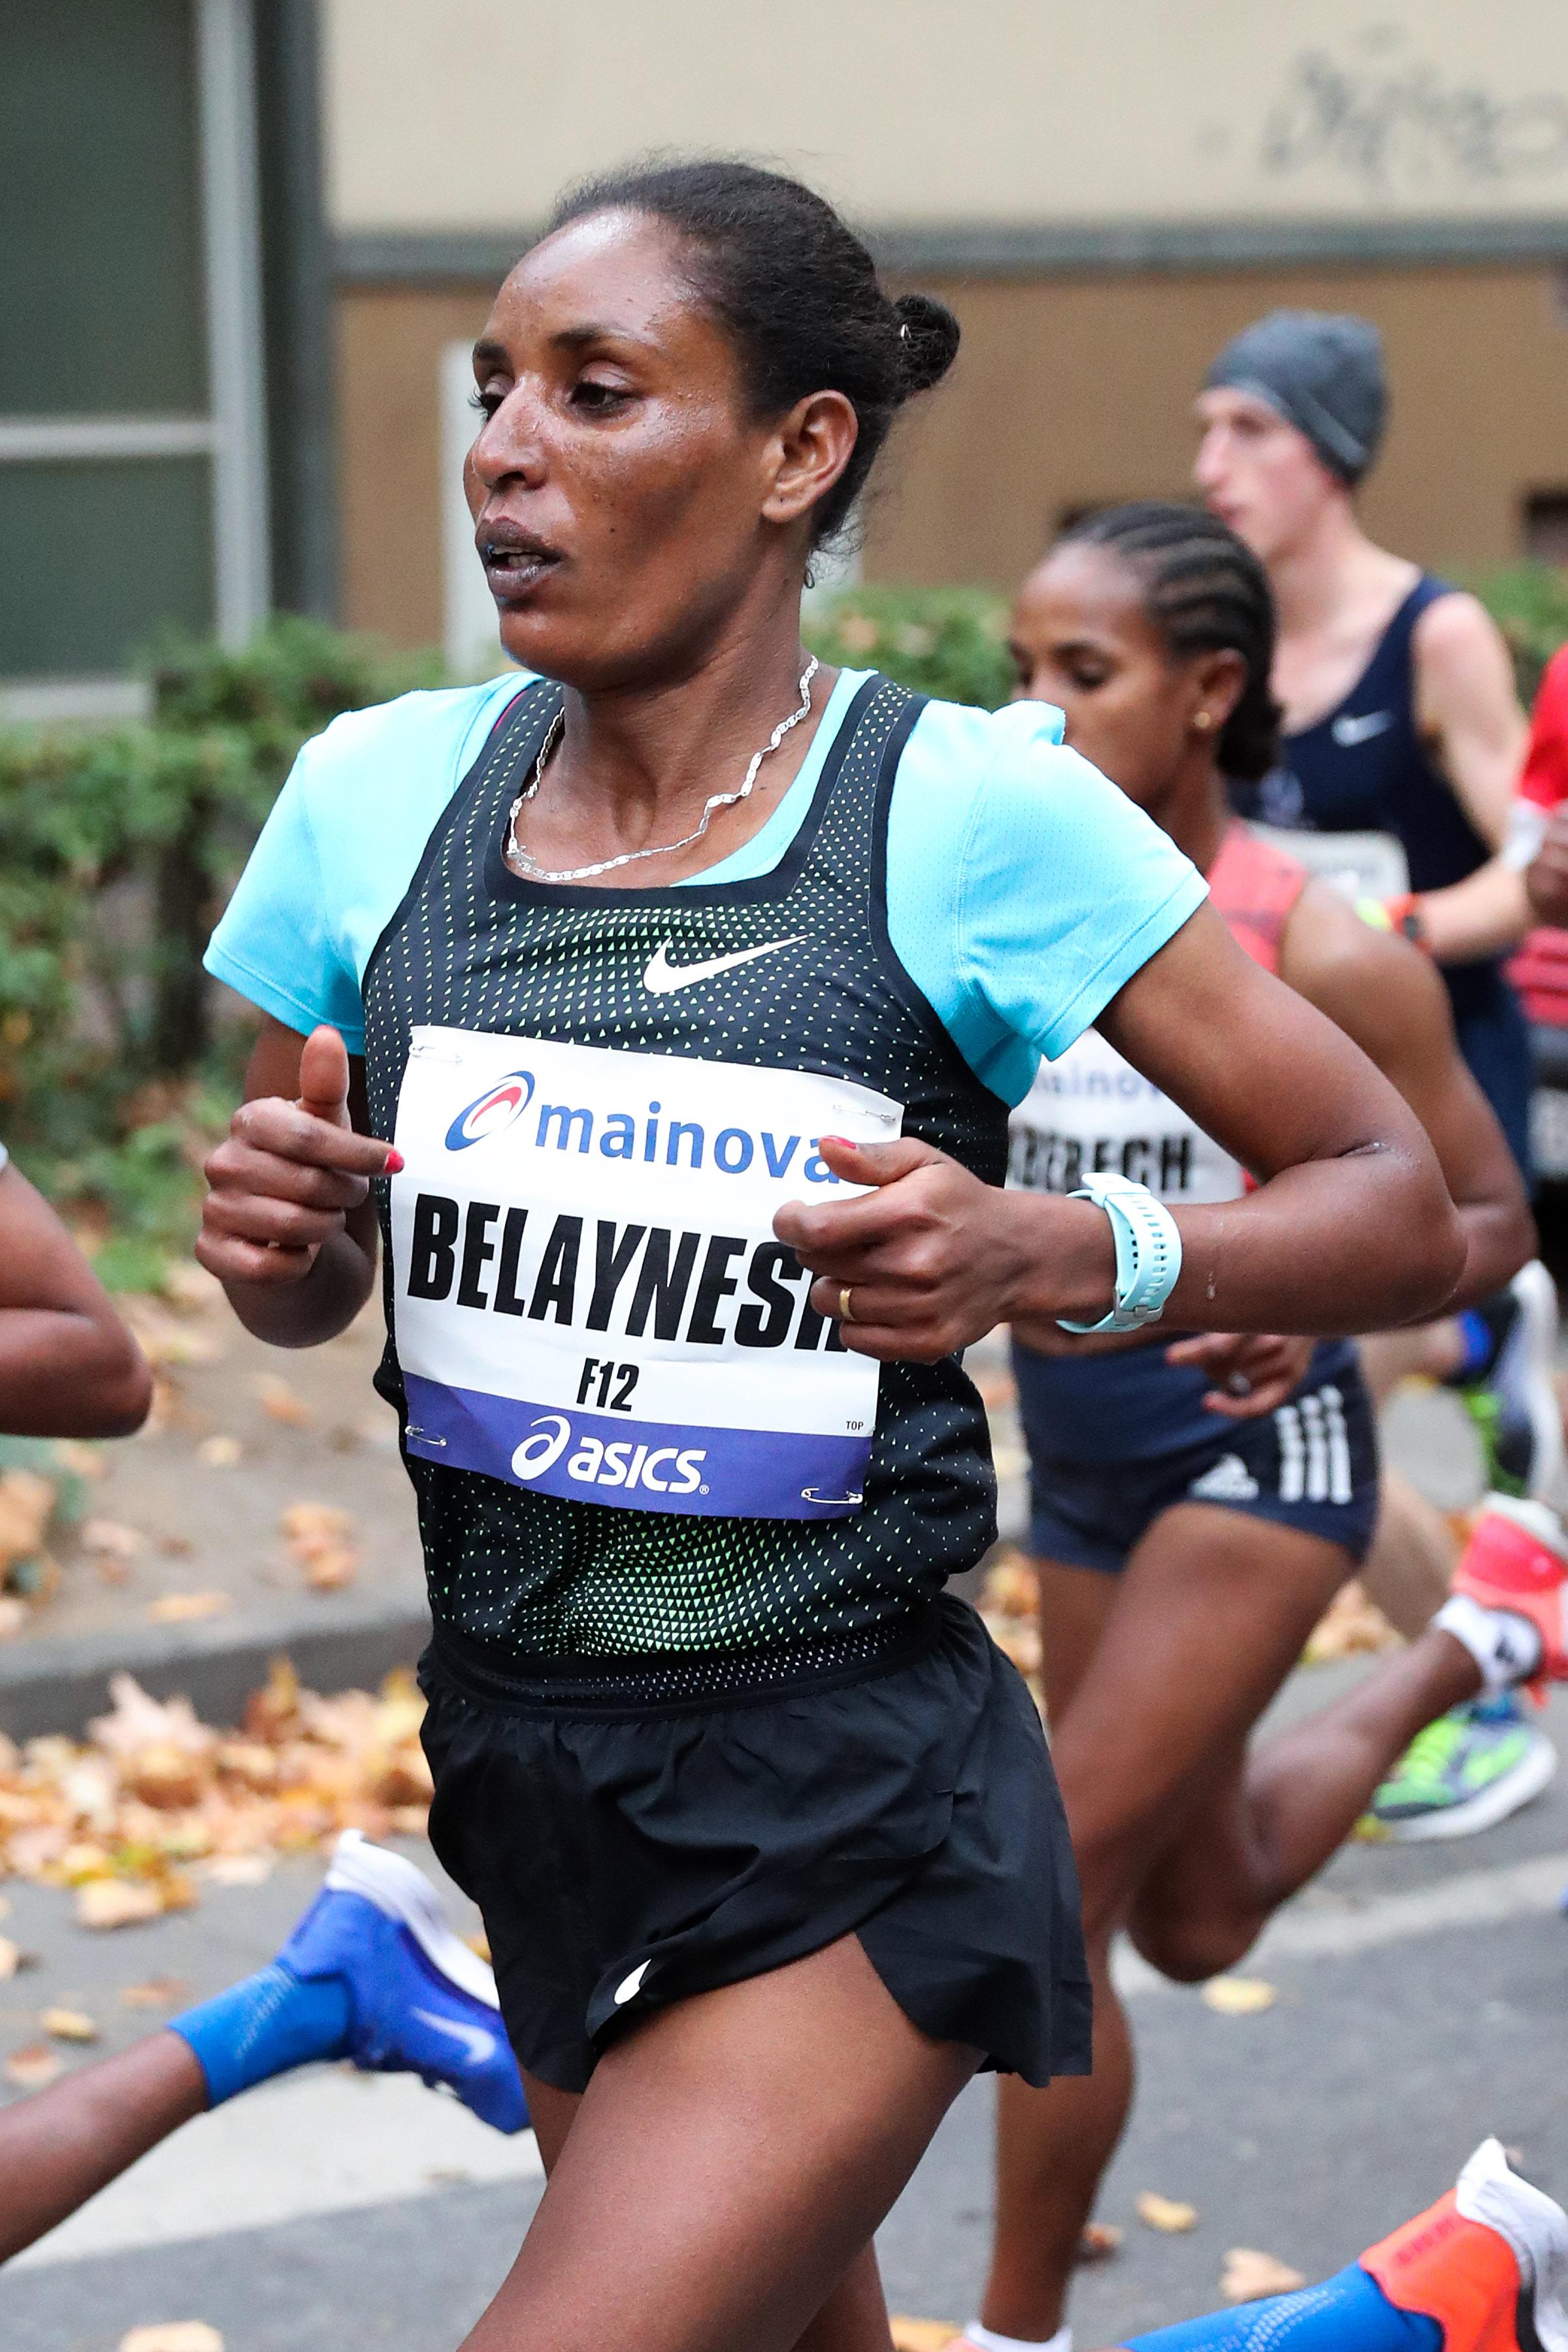 Ethiopia Sends World Class Women to Toronto, - Athletics Illustrated